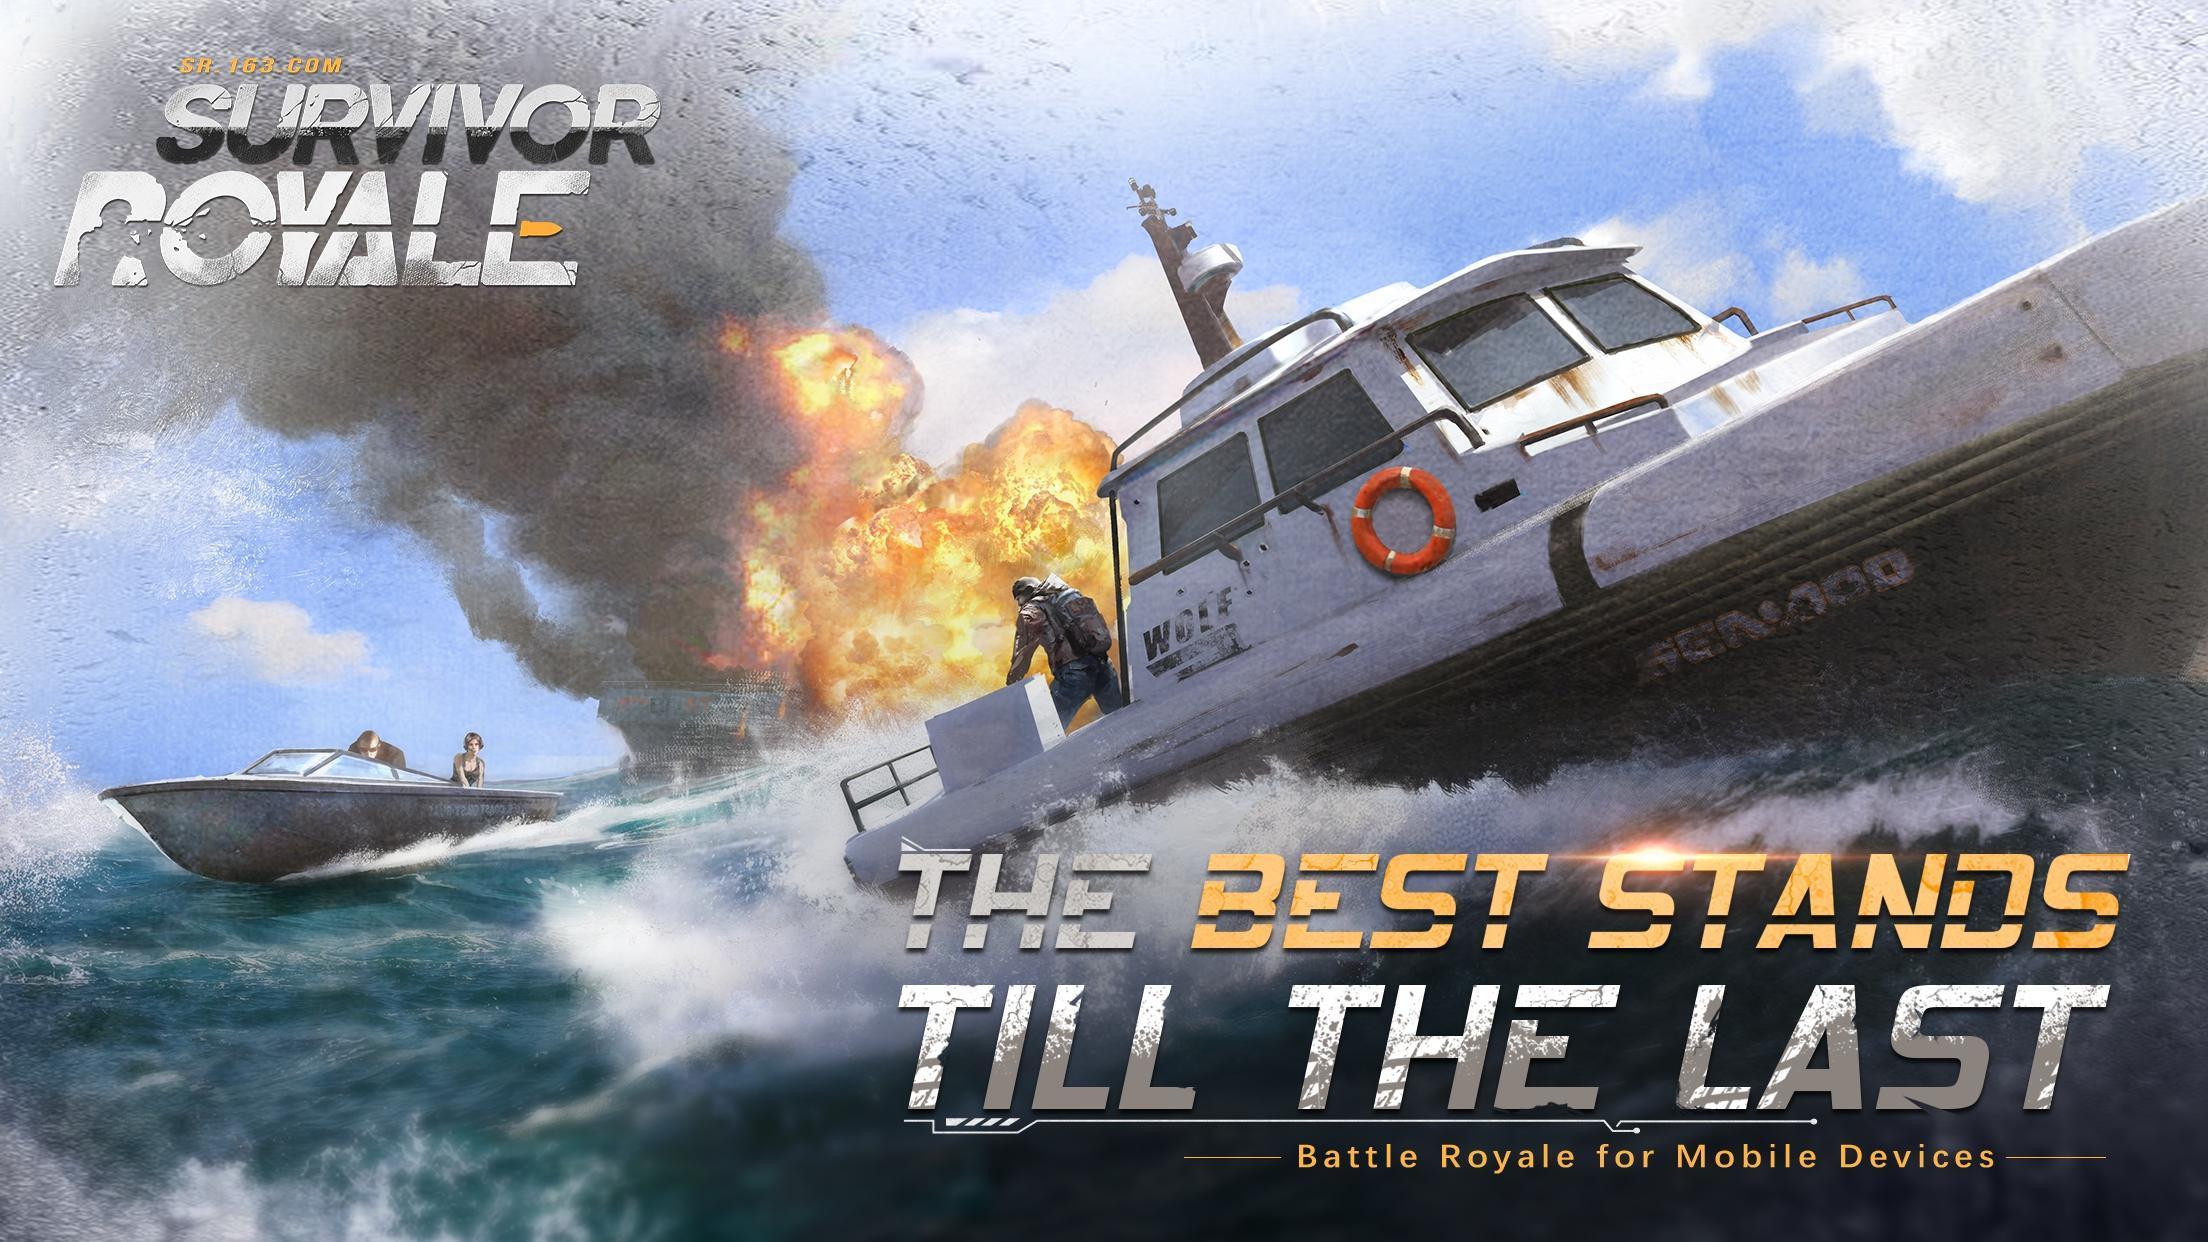 Survivor Royale for Android - APK Download